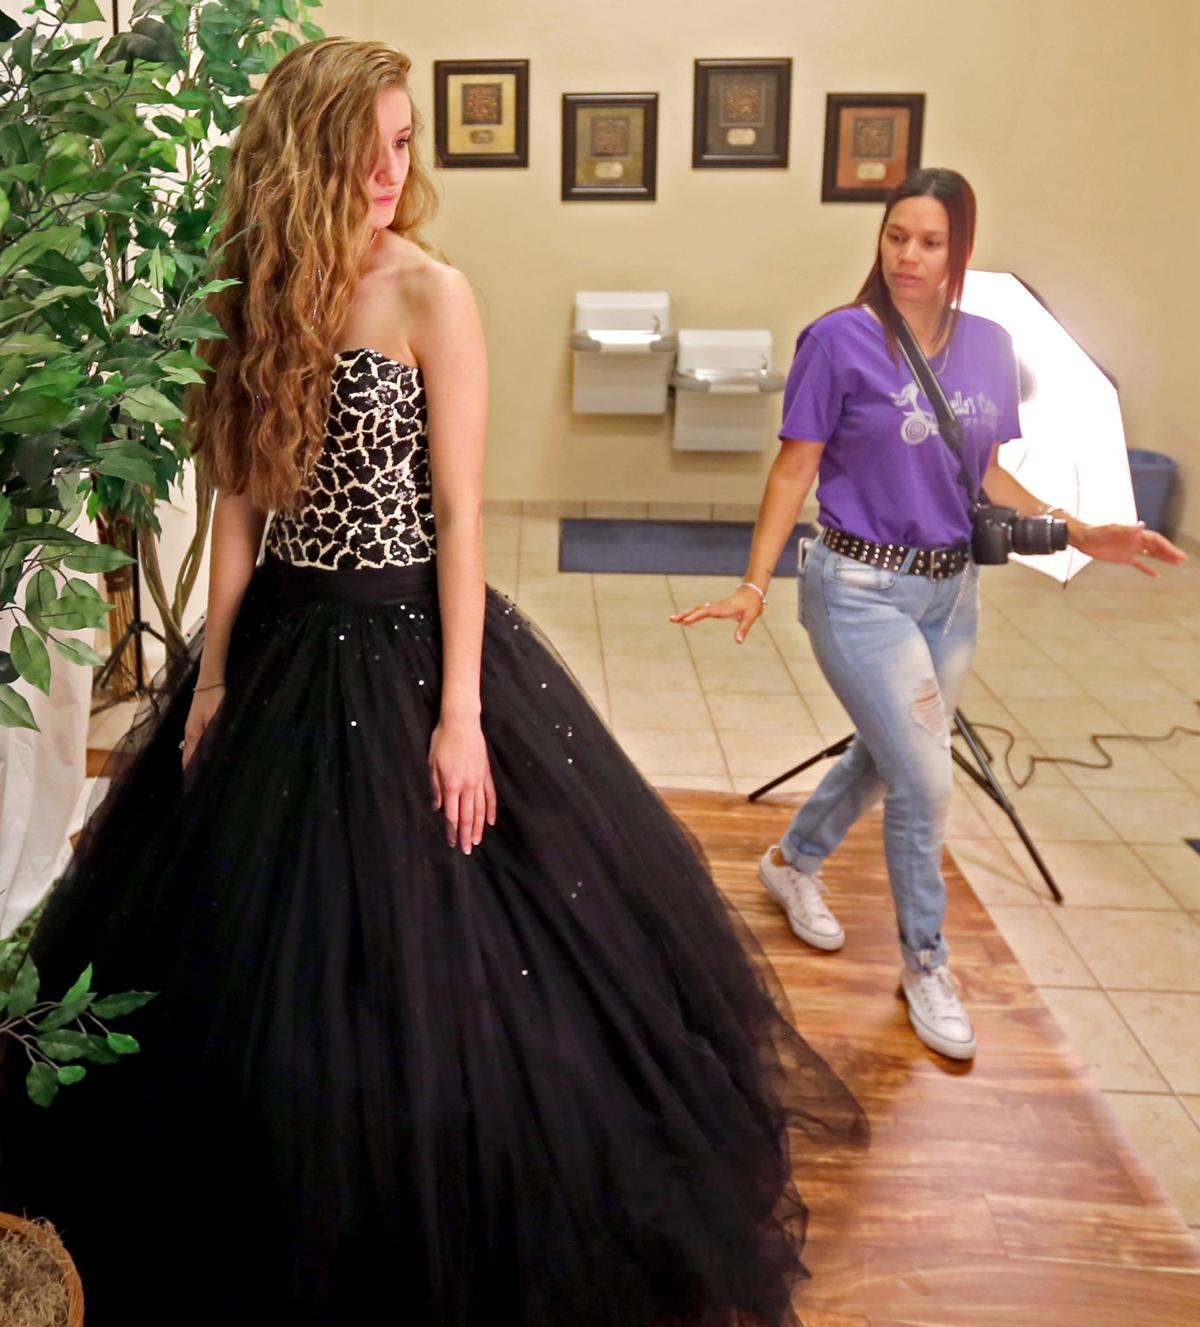 Preparing for prom at the 11th annual Cinderella\'s Closet | Local ...